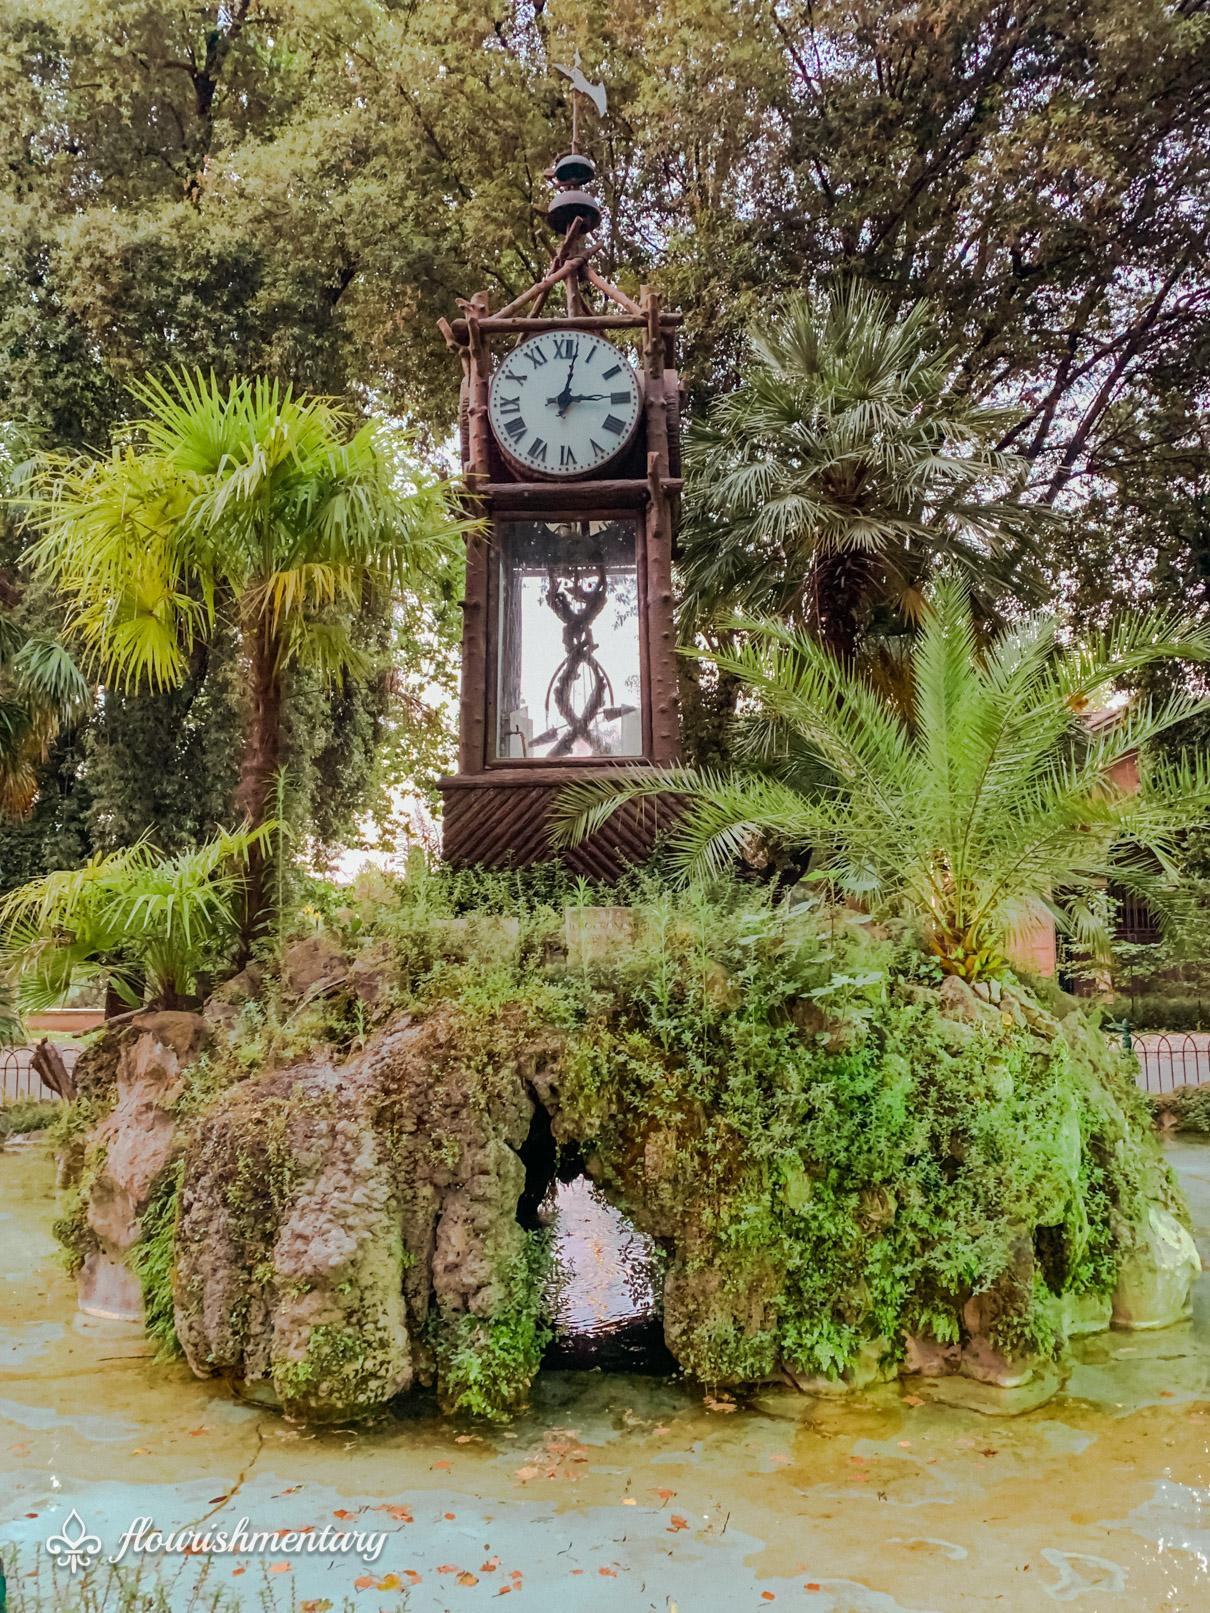 Villa Borghese Gardens Hydrochronometer